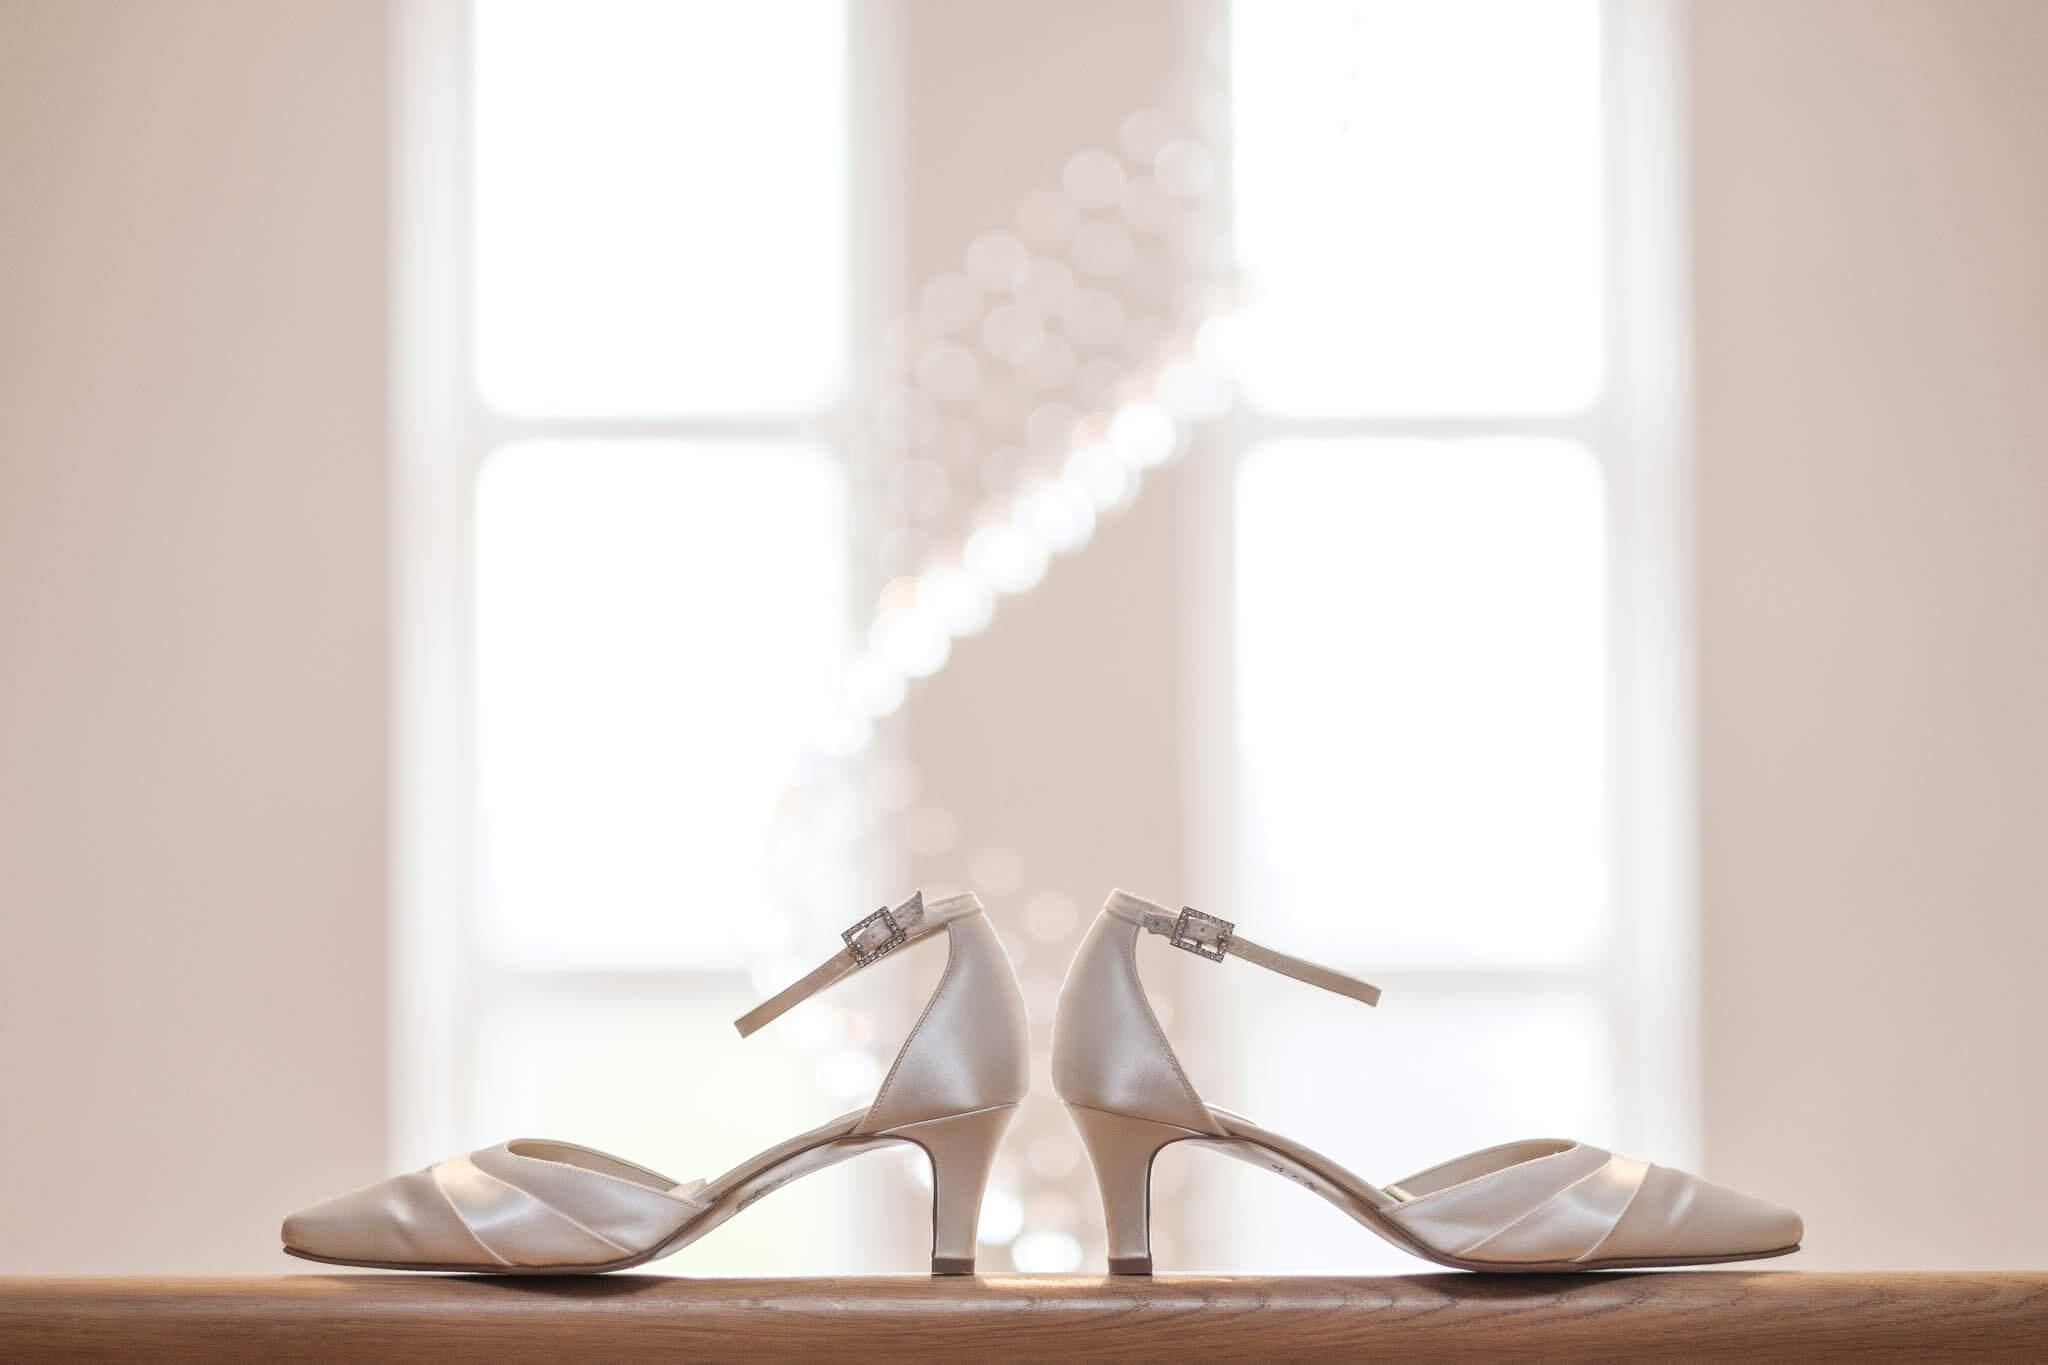 bruidsschoenen detailfoto peter geluk